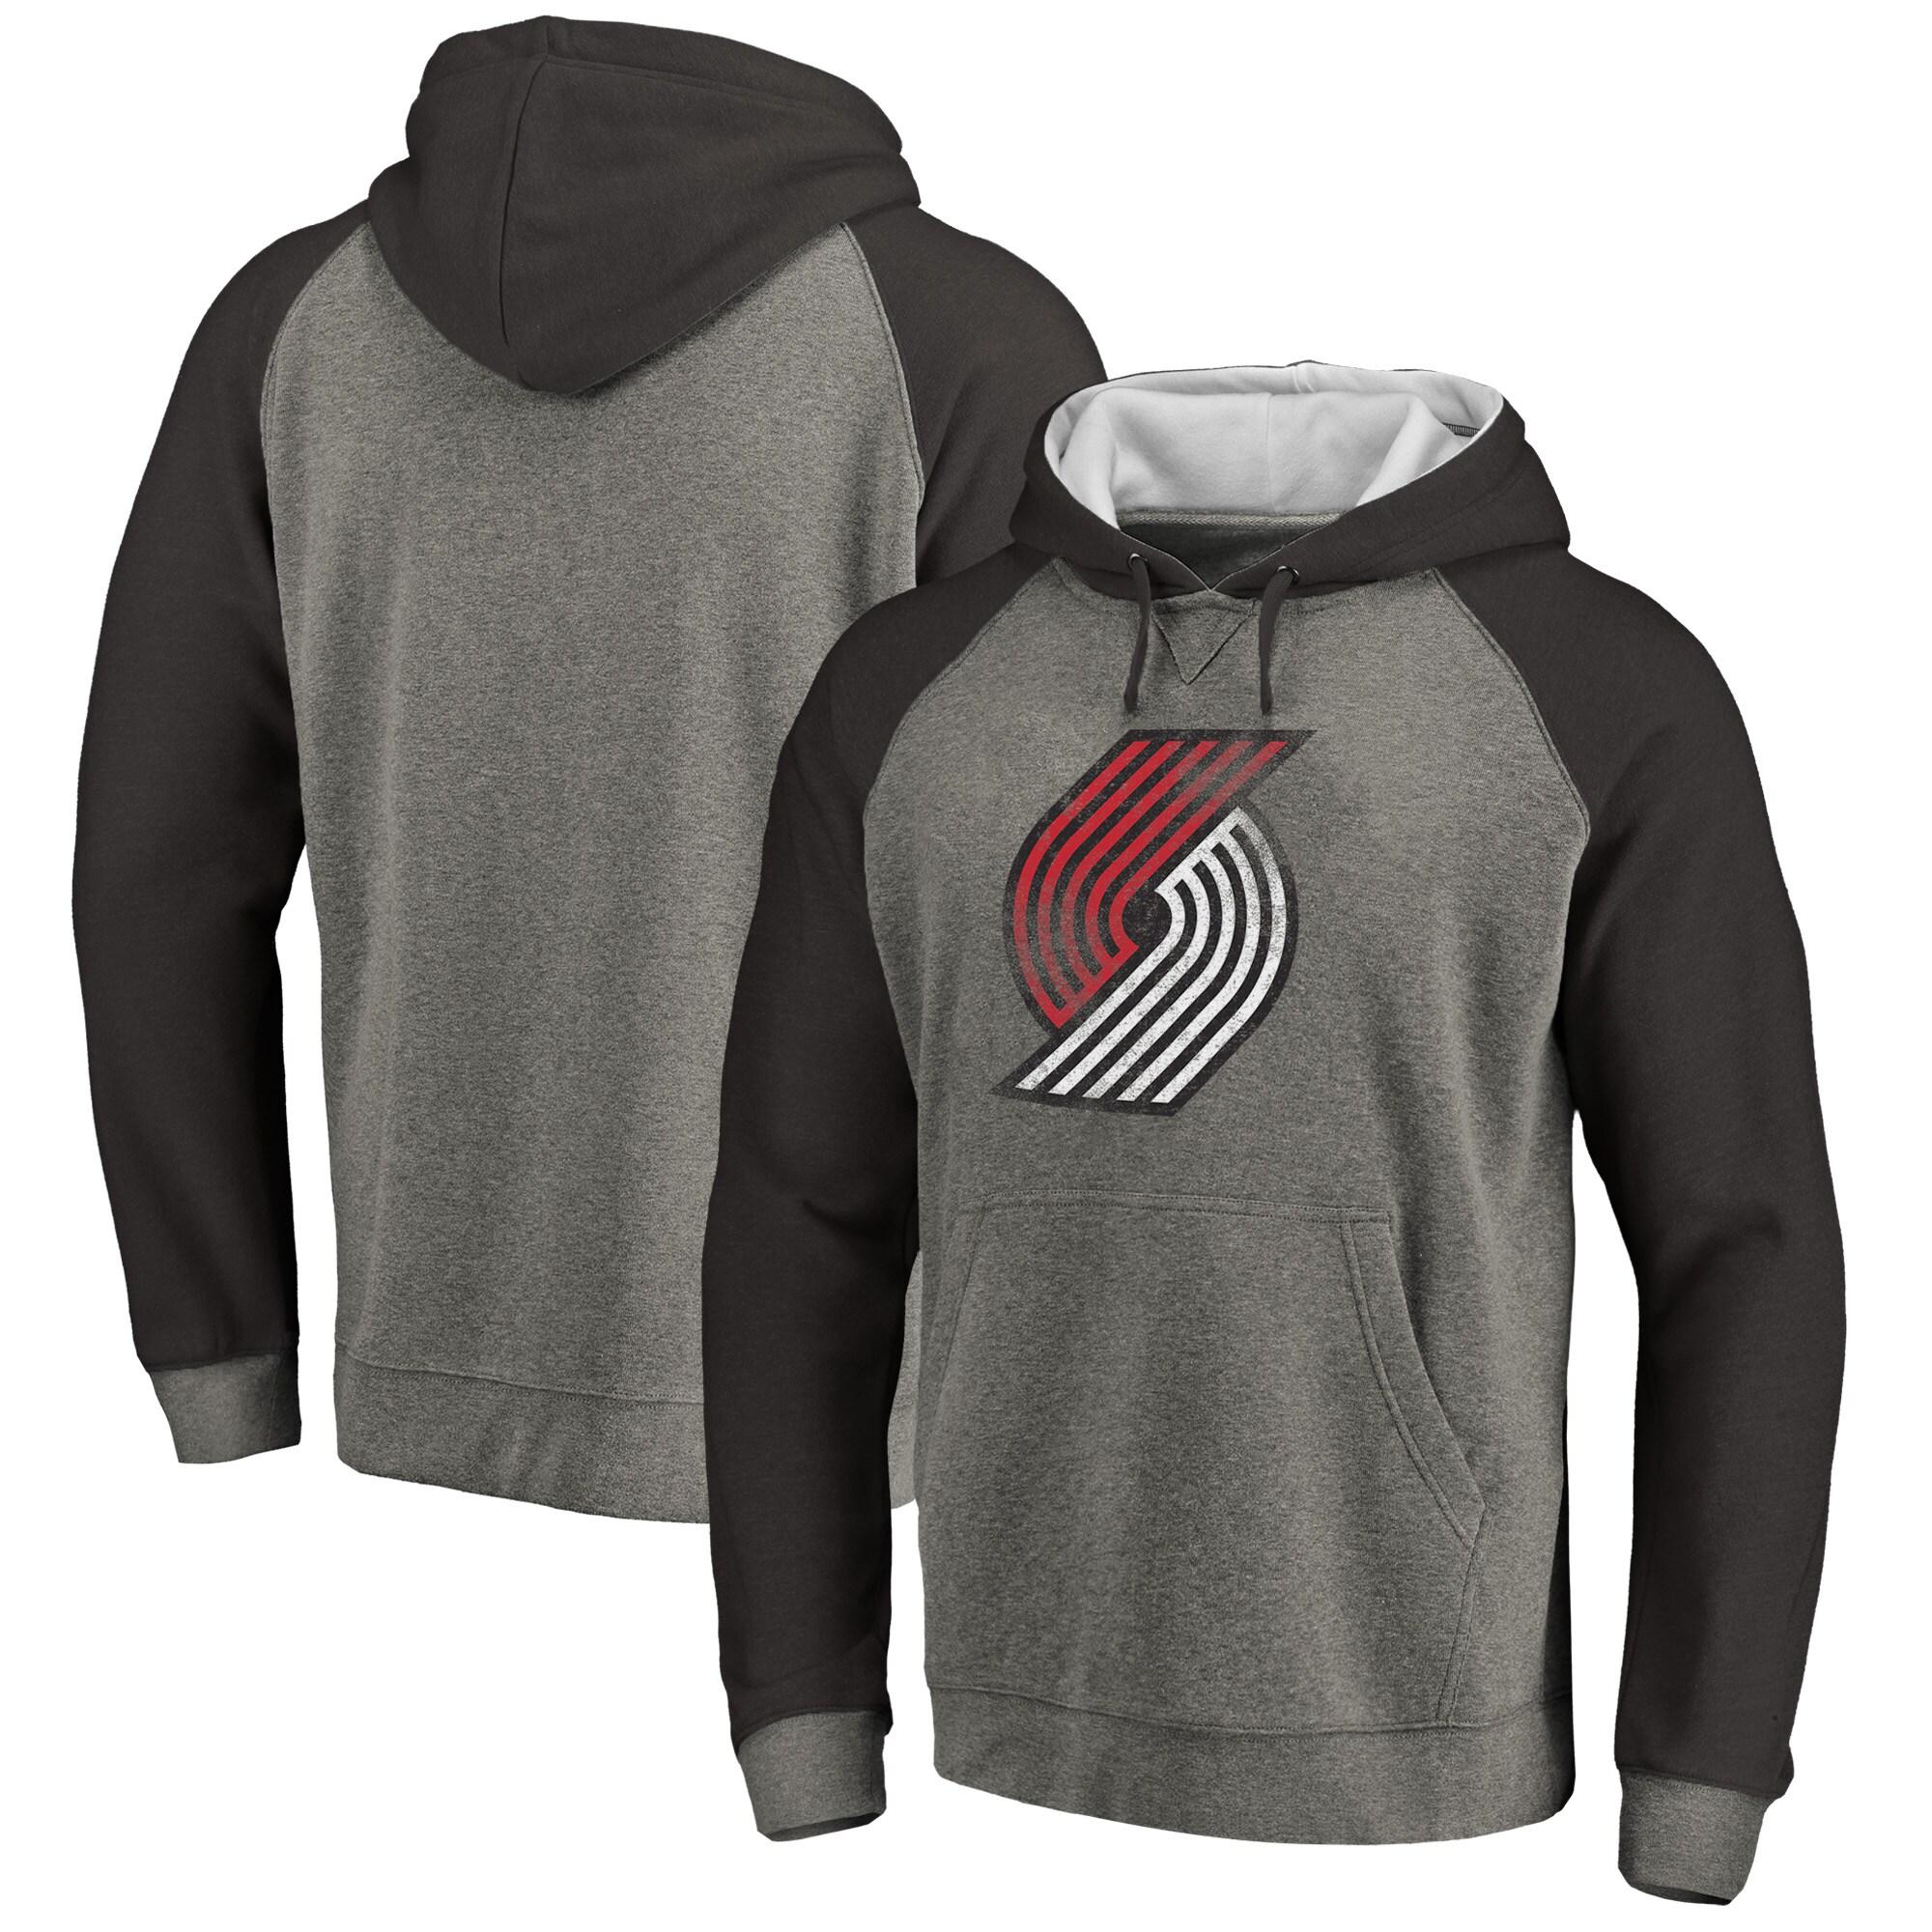 Portland Trail Blazers Fanatics Branded Distressed Logo Tri-Blend Pullover Hoodie - Ash/Black